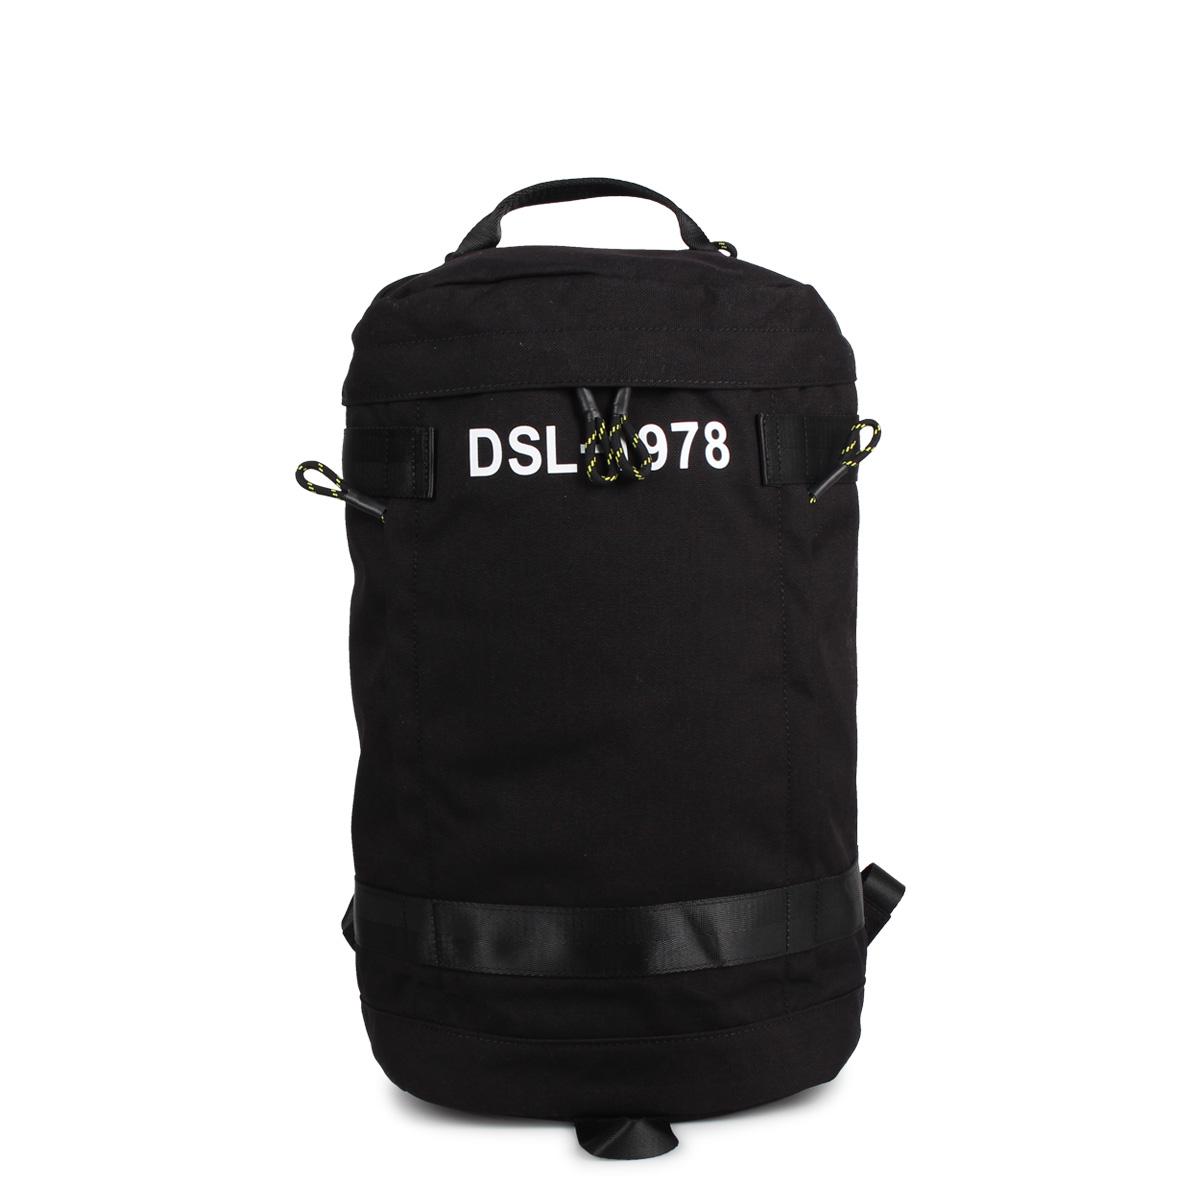 DIESEL URBHANITY PIEVE ディーゼル リュック バッグ バックパック メンズ ブラック 黒 X06259-P1516